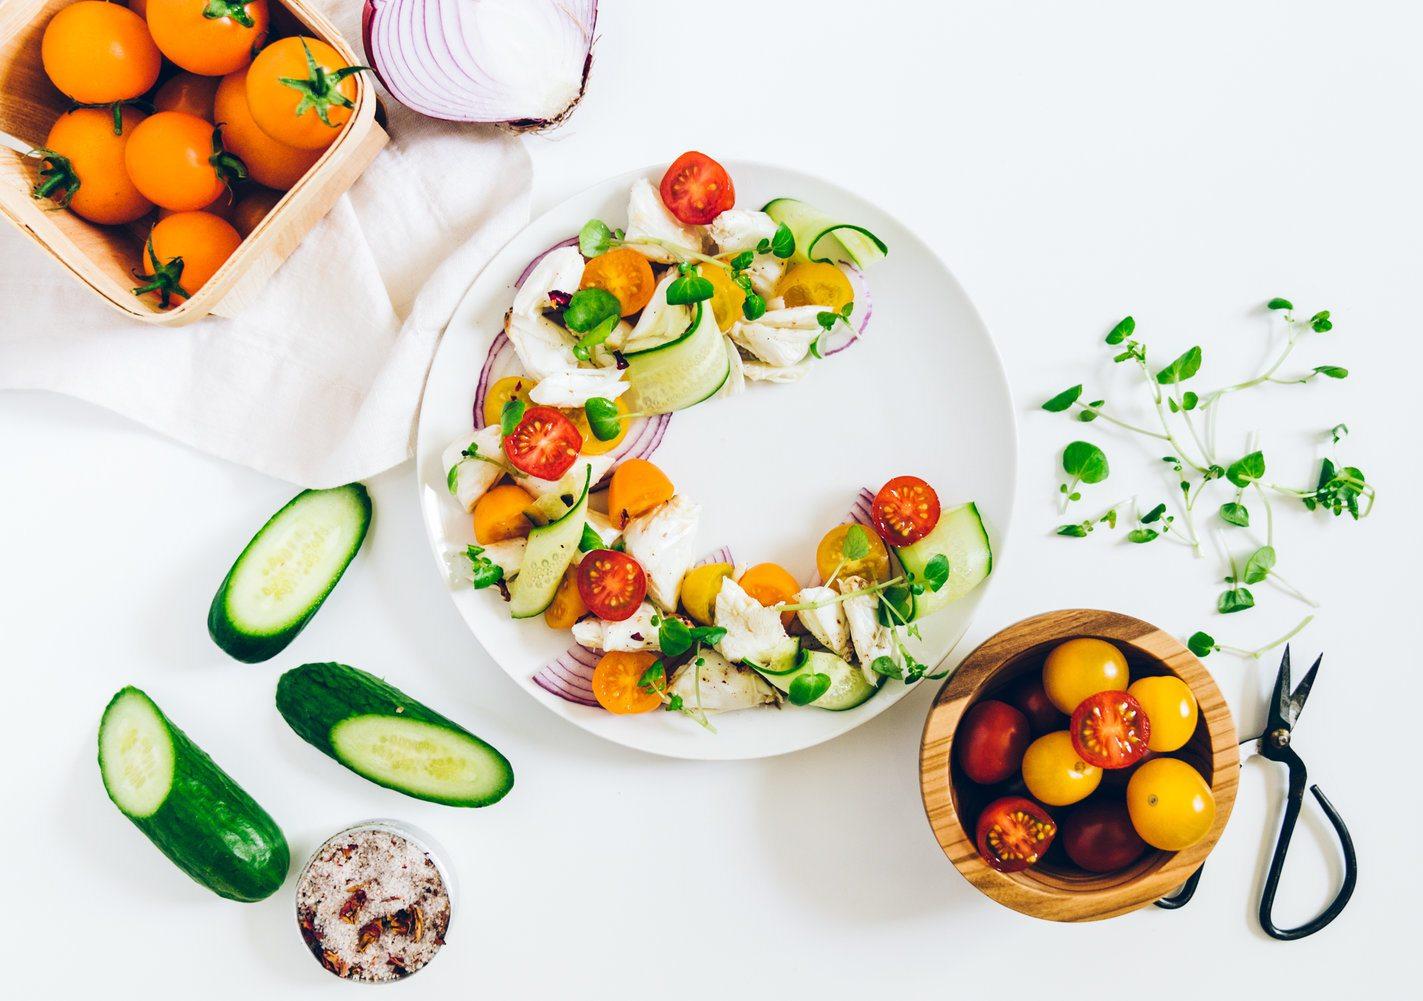 Summer's Last Hoorah: Favorite Labor Day Eats